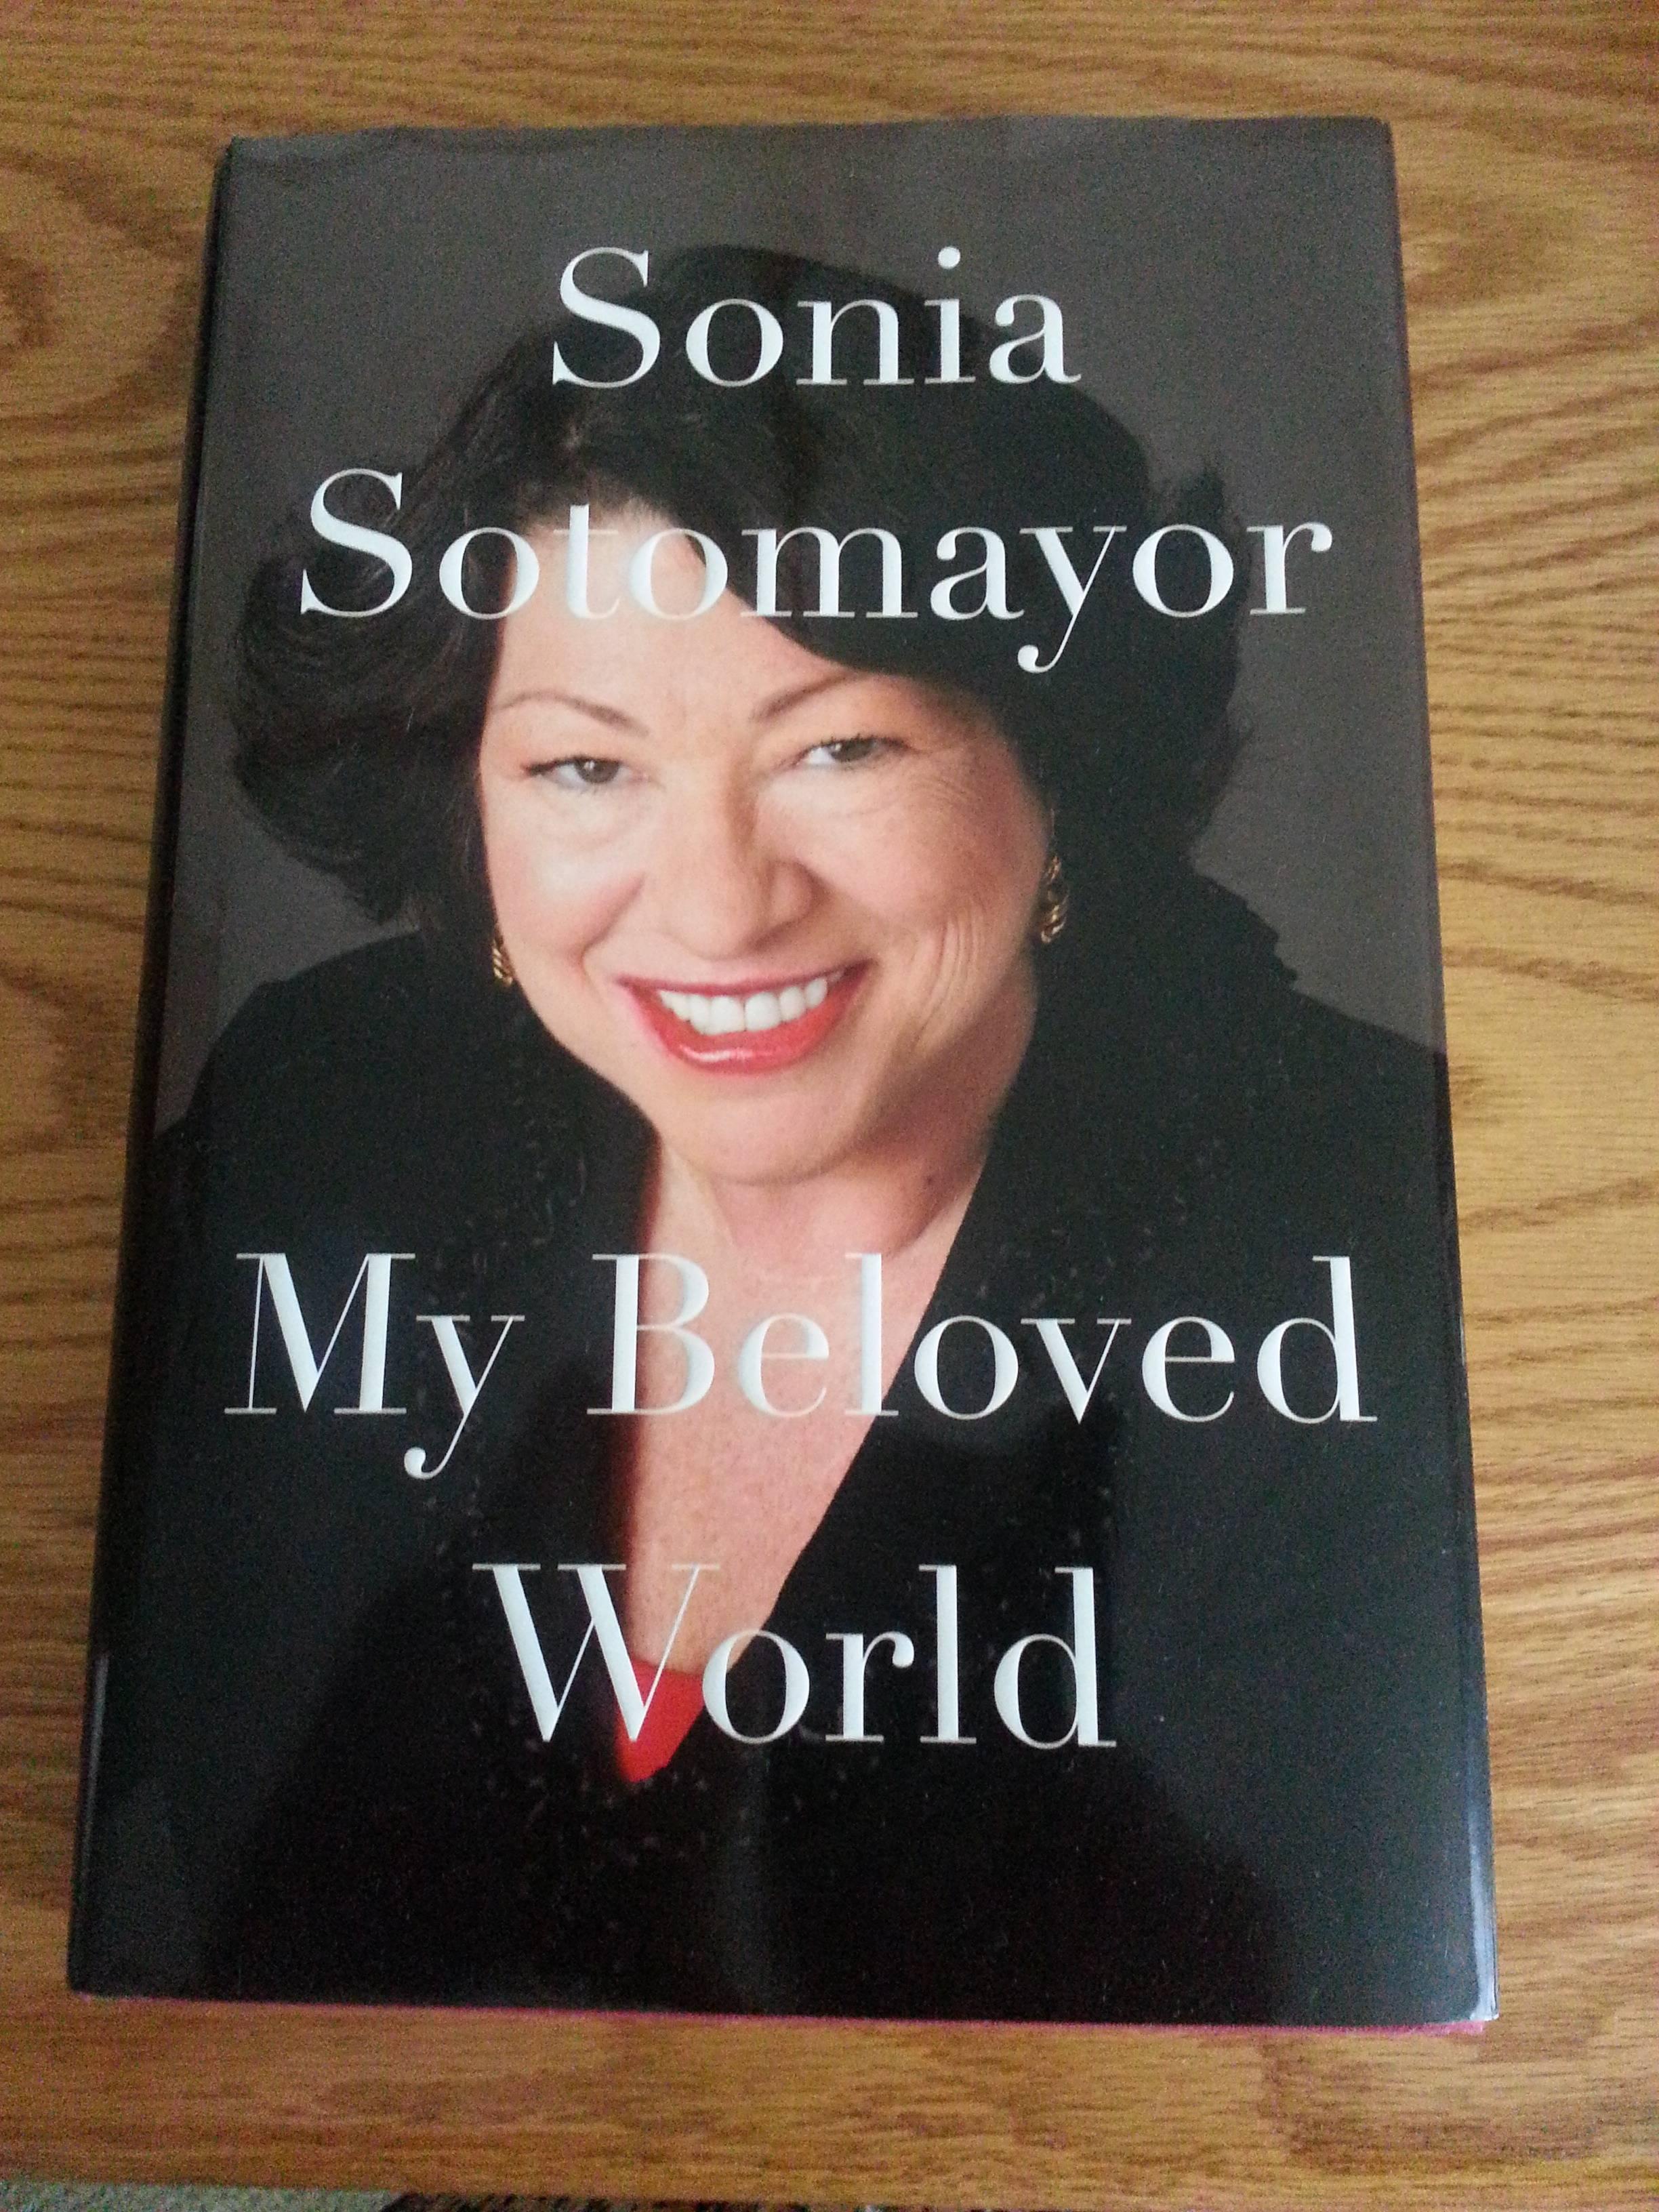 Sonia sotomayor biography essay